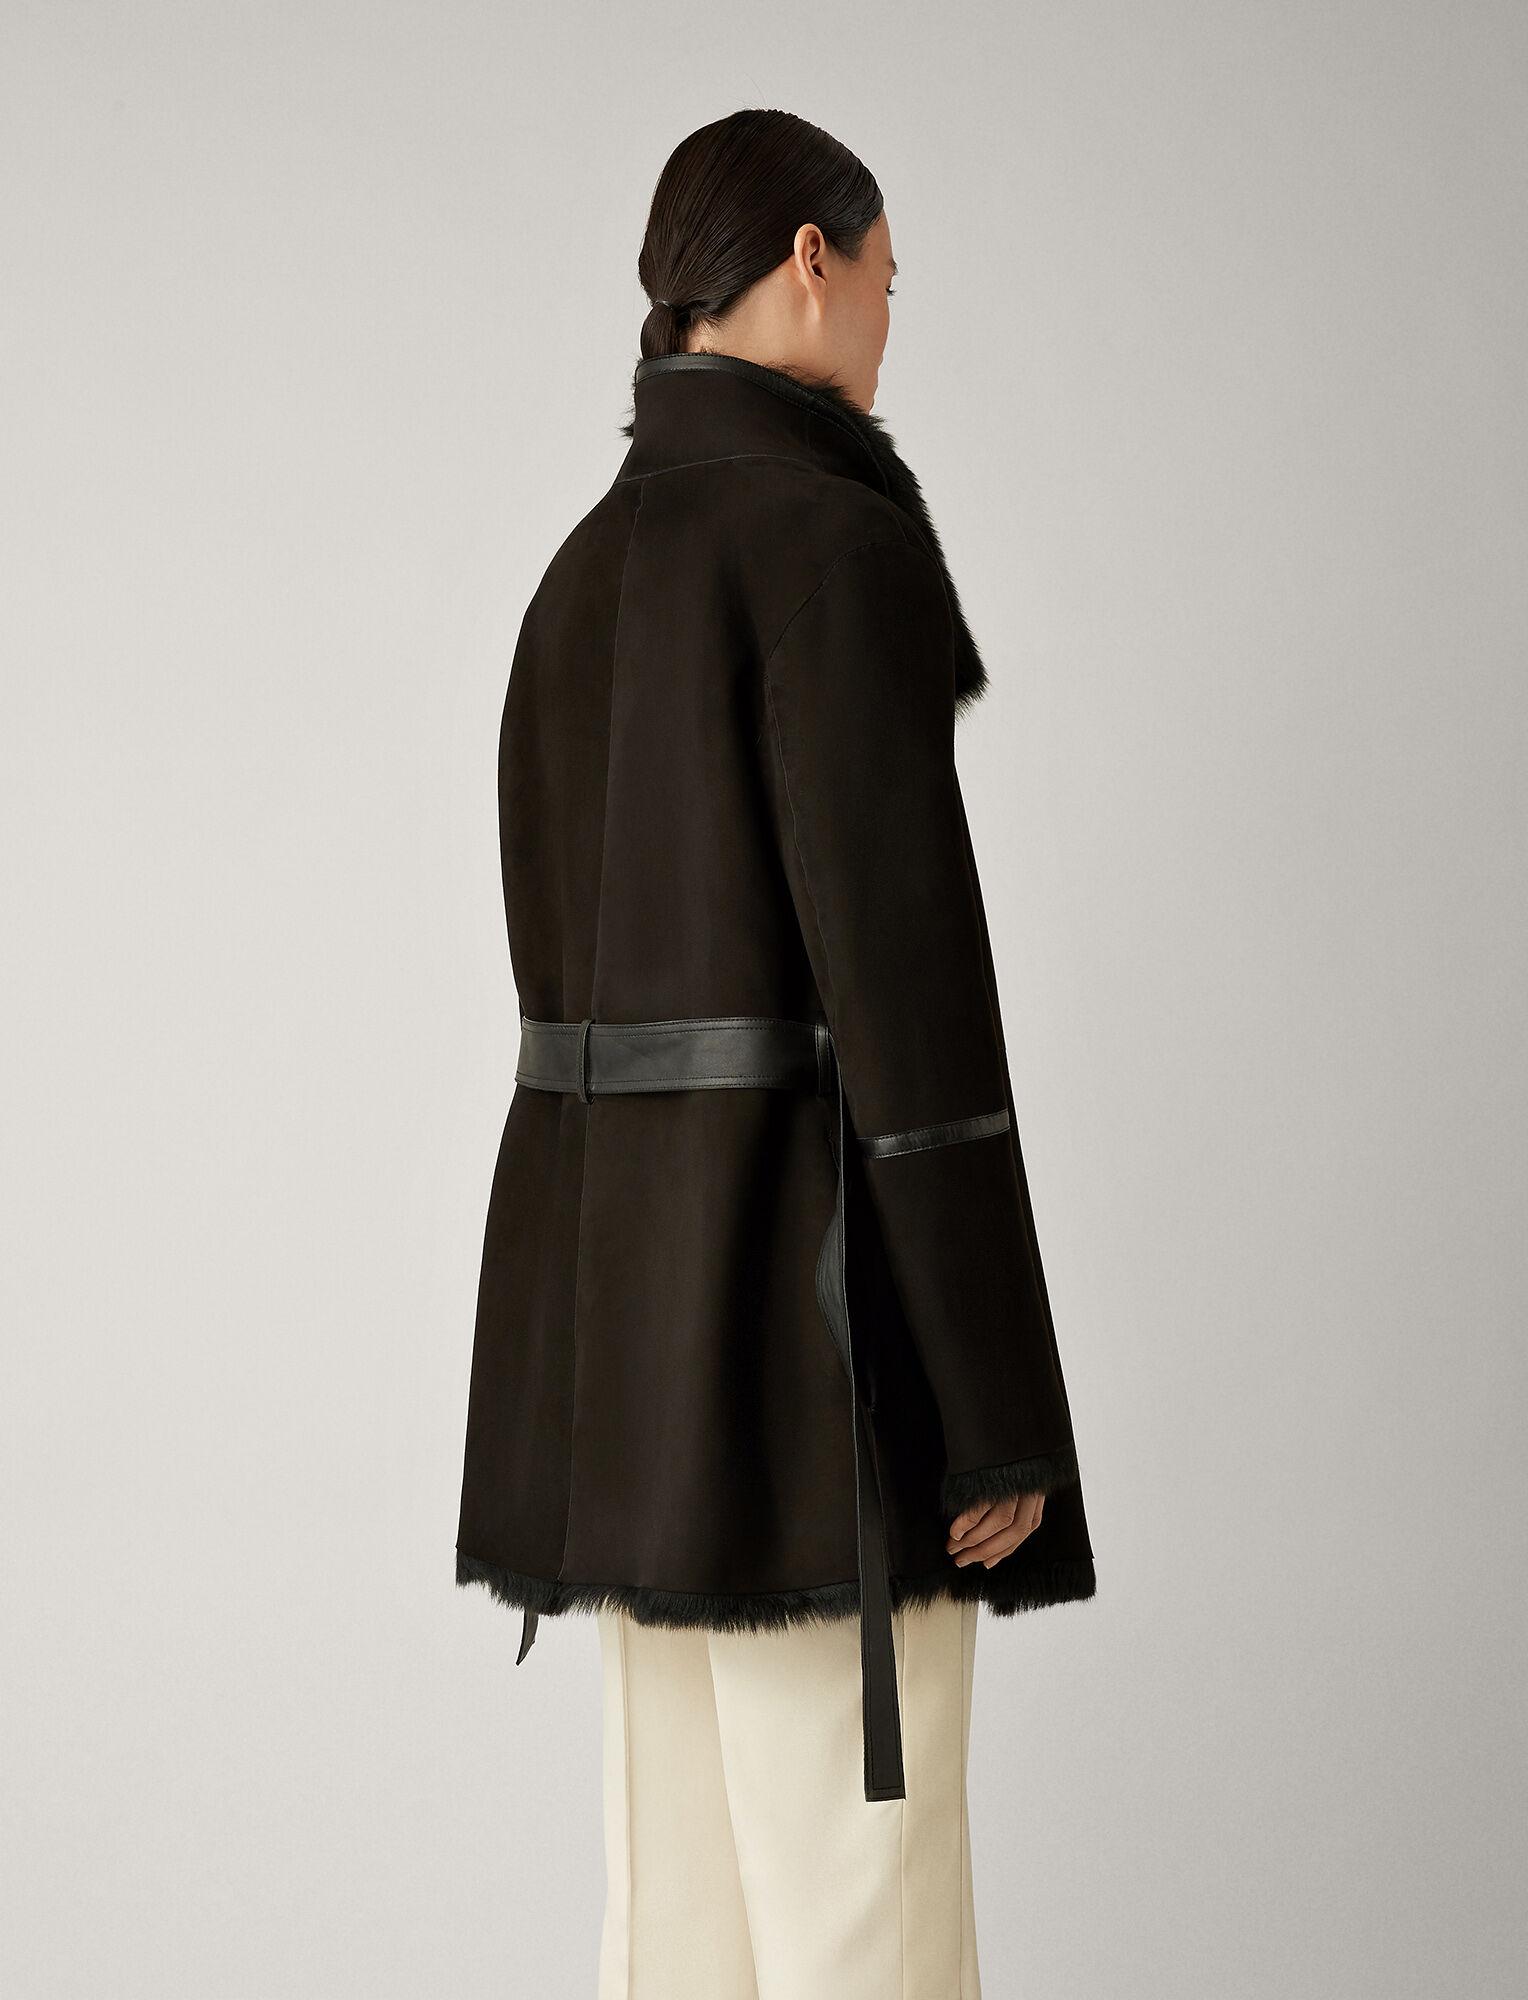 Joseph, Liman Short Soft Toscana Sheepskin, in BLACK